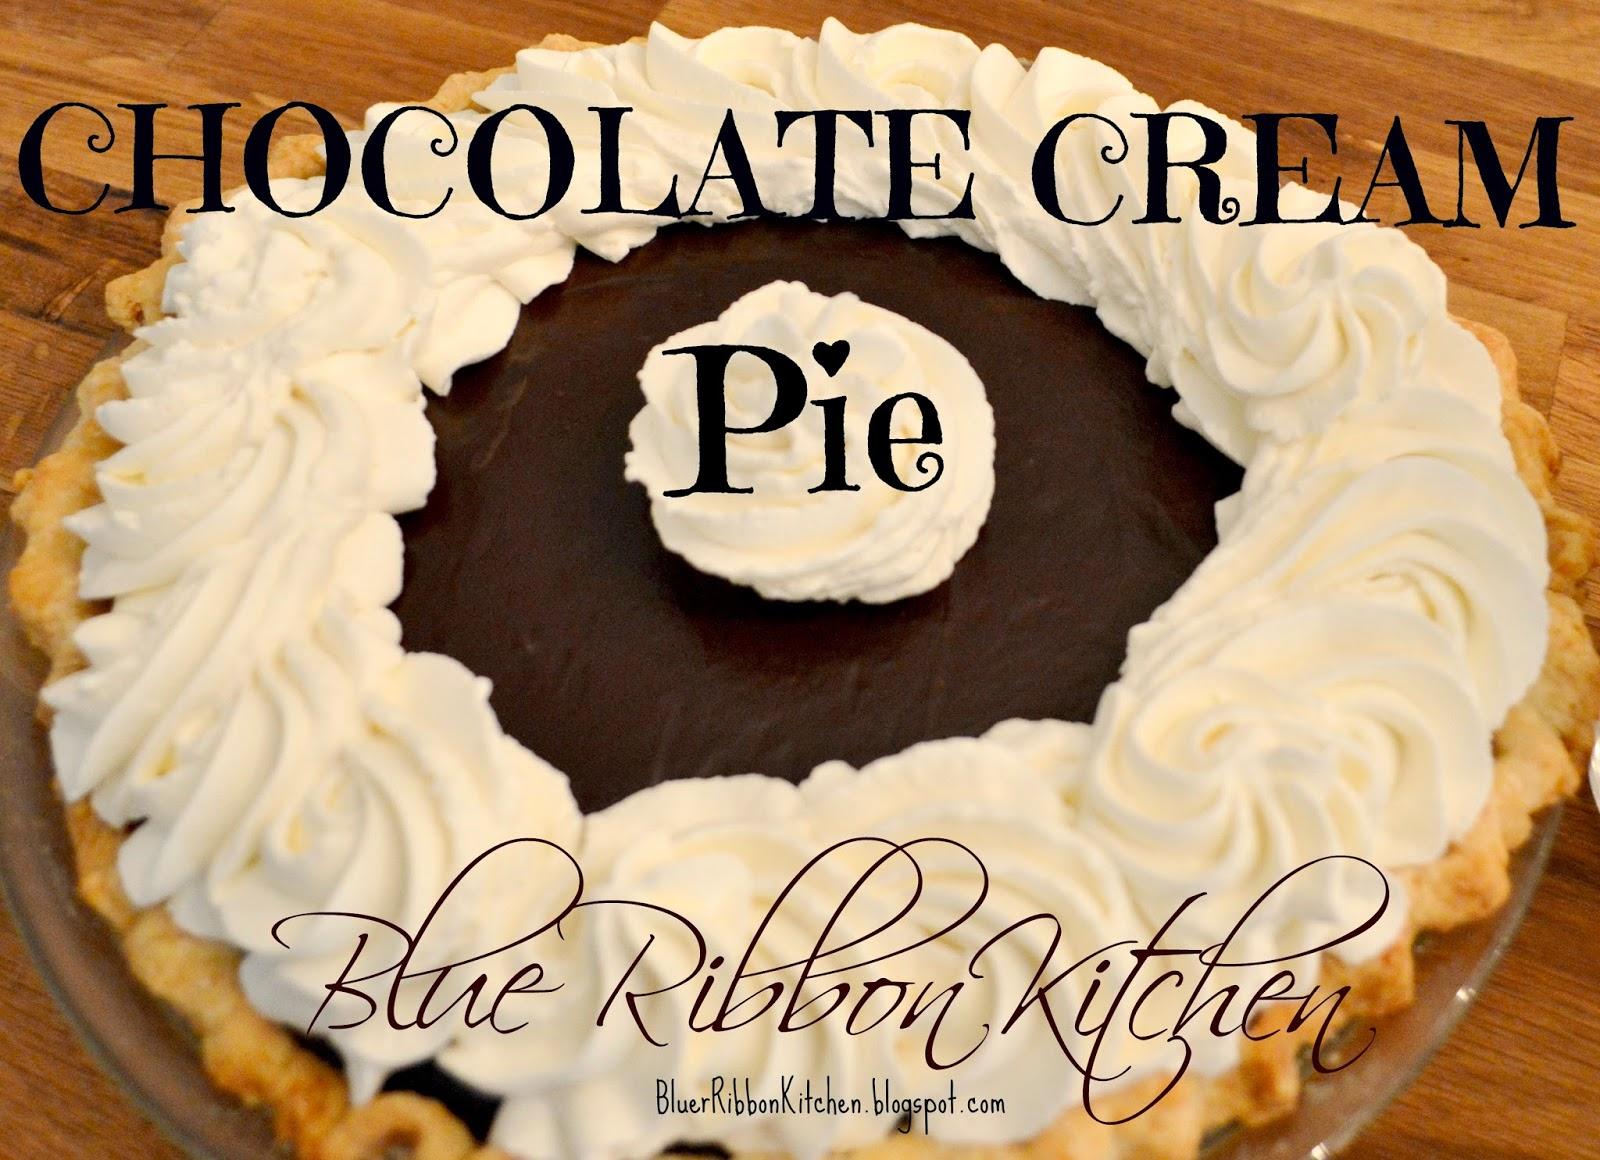 Blue Ribbon Kitchen Chocolate Cream Piea Winner